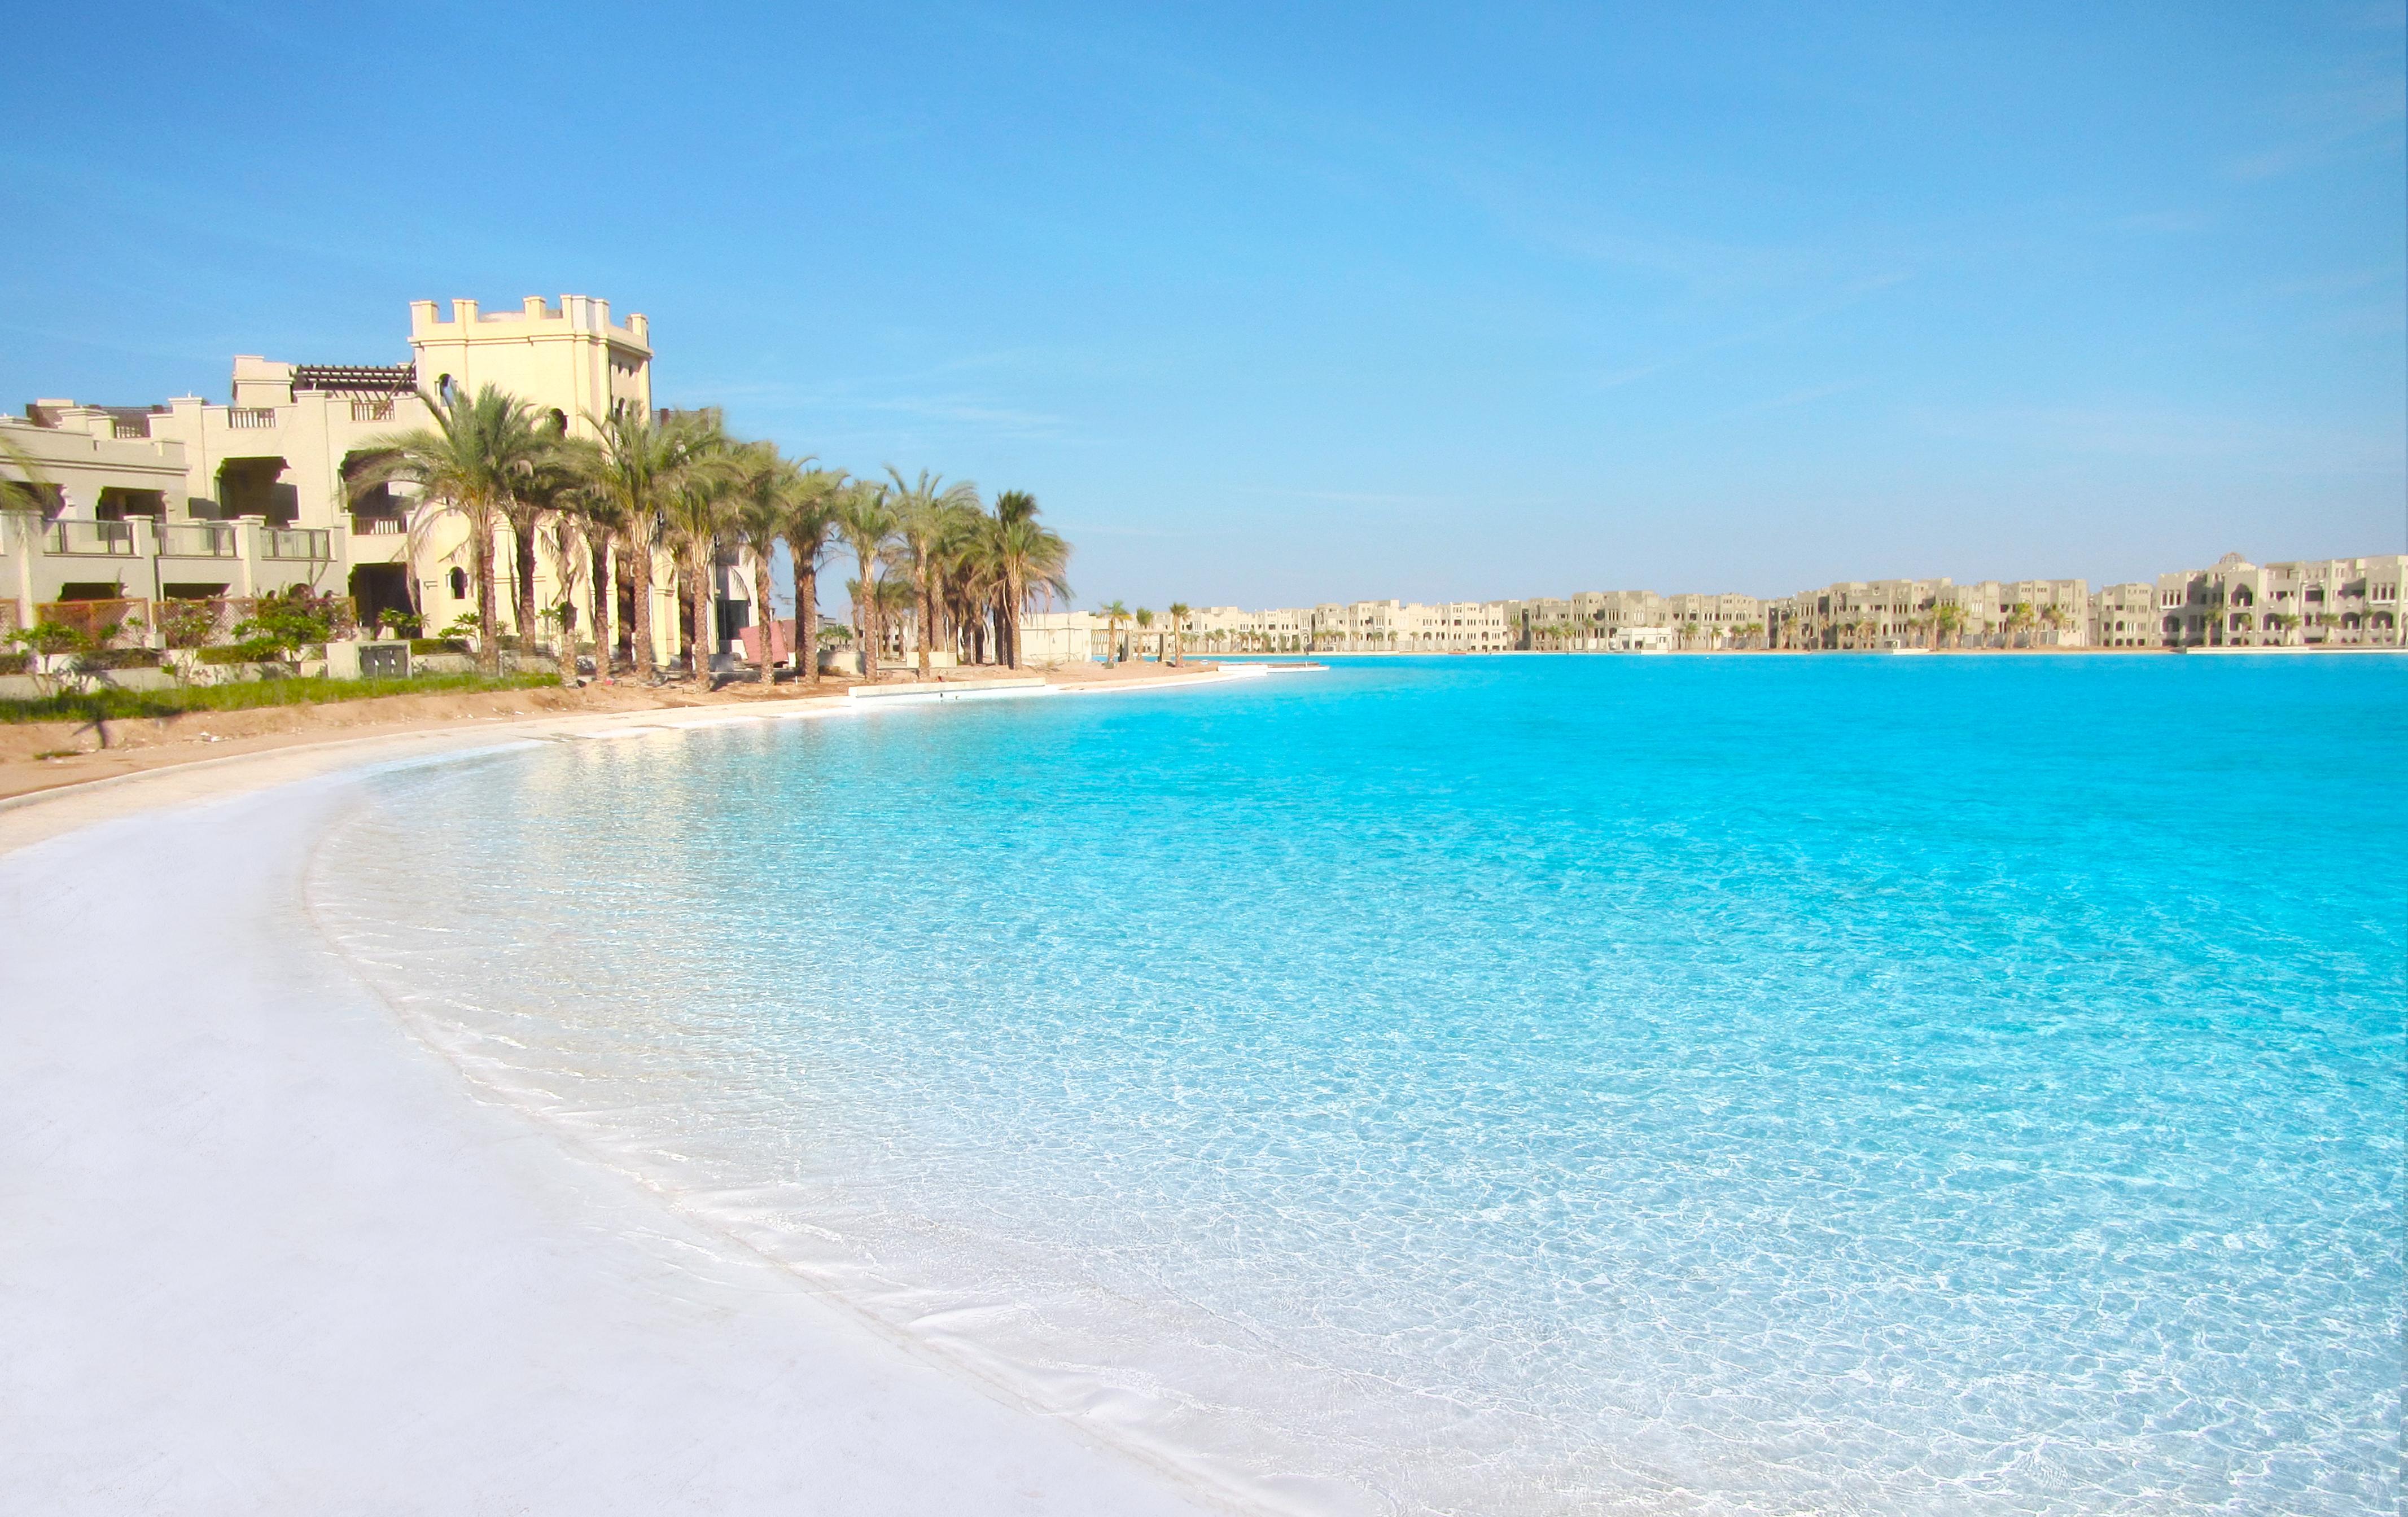 Hotel de lujo con piscina natural